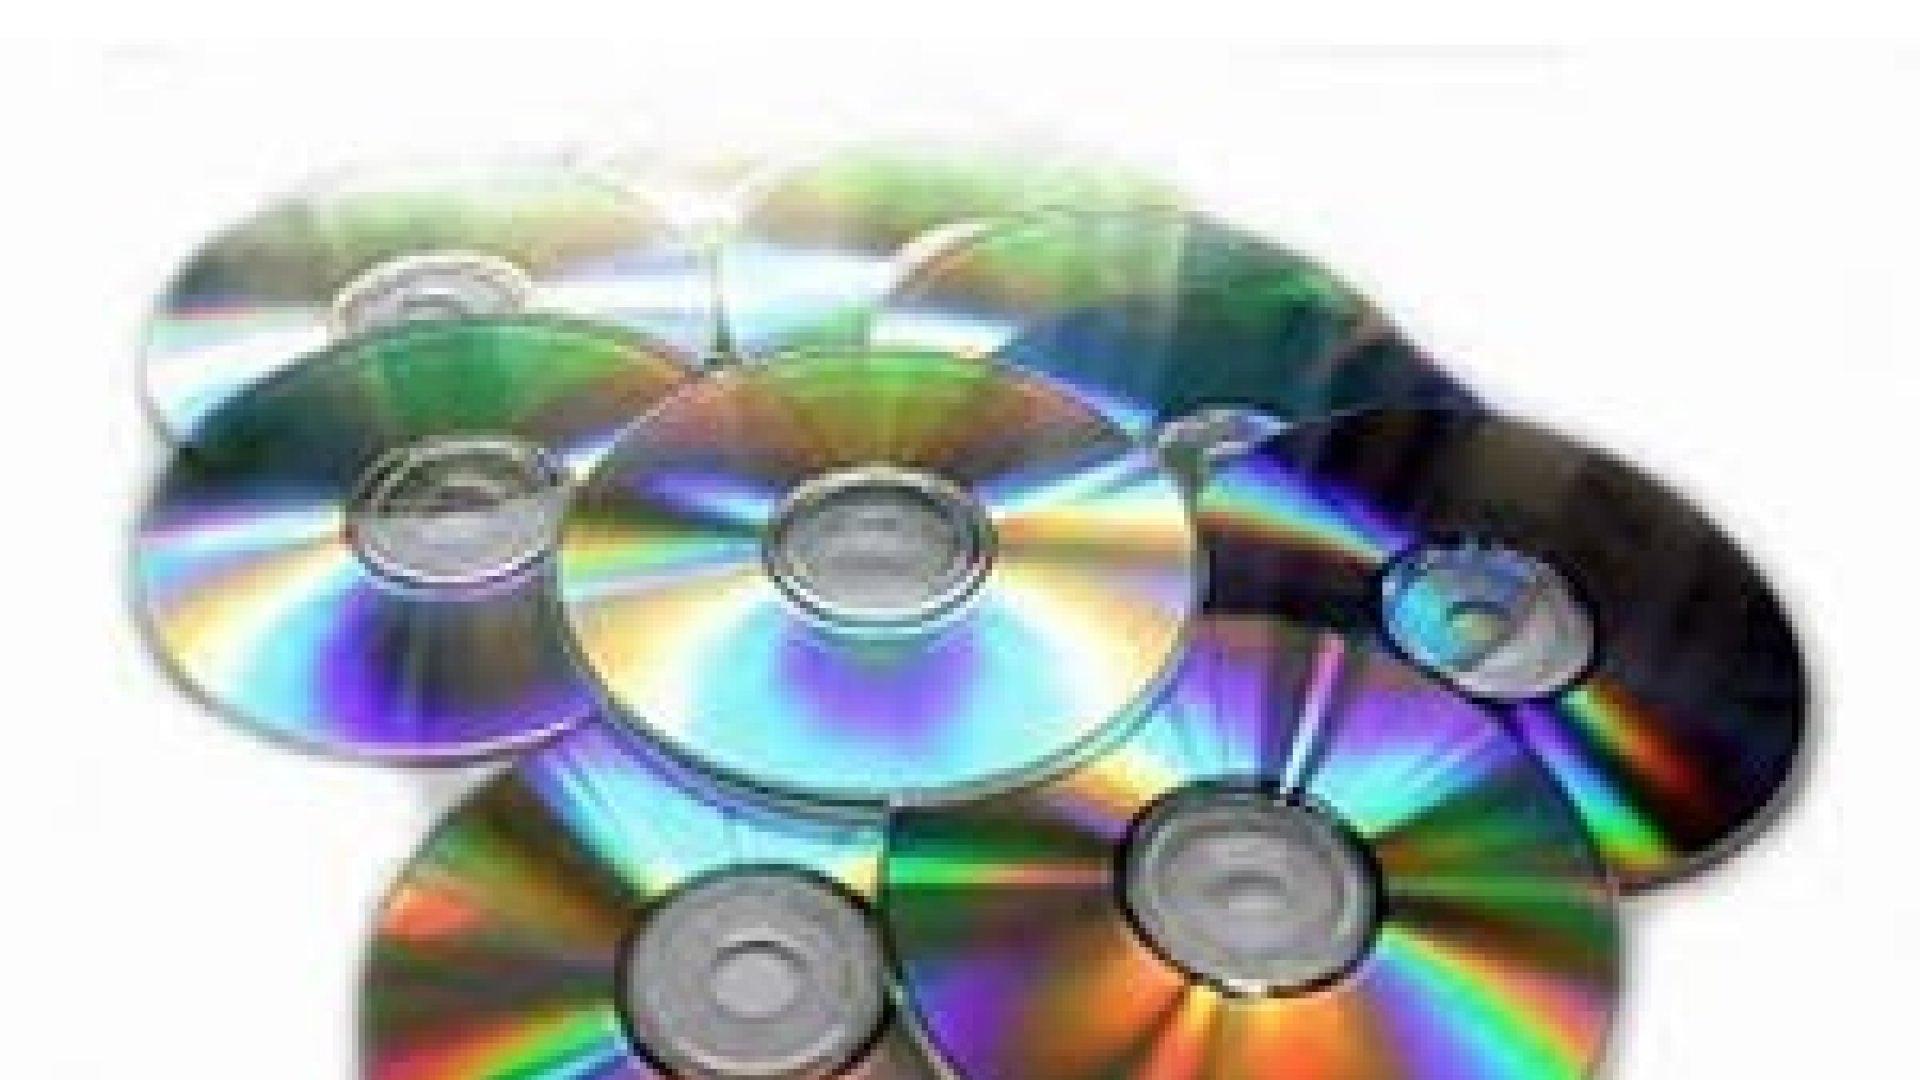 cd-dvd-usb